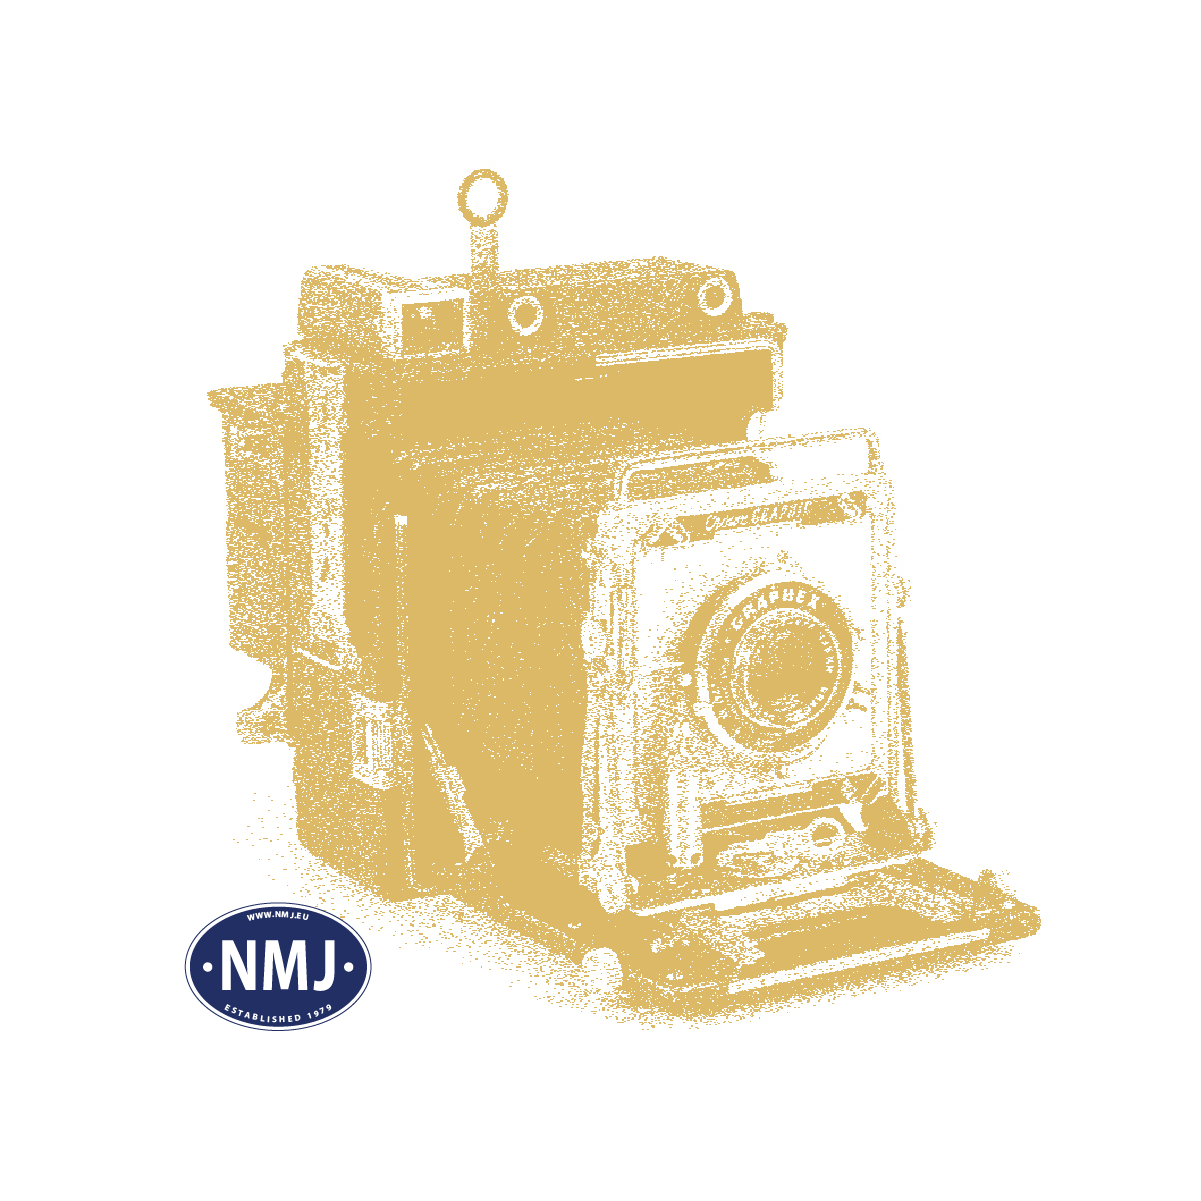 NOC14833 - Innredning